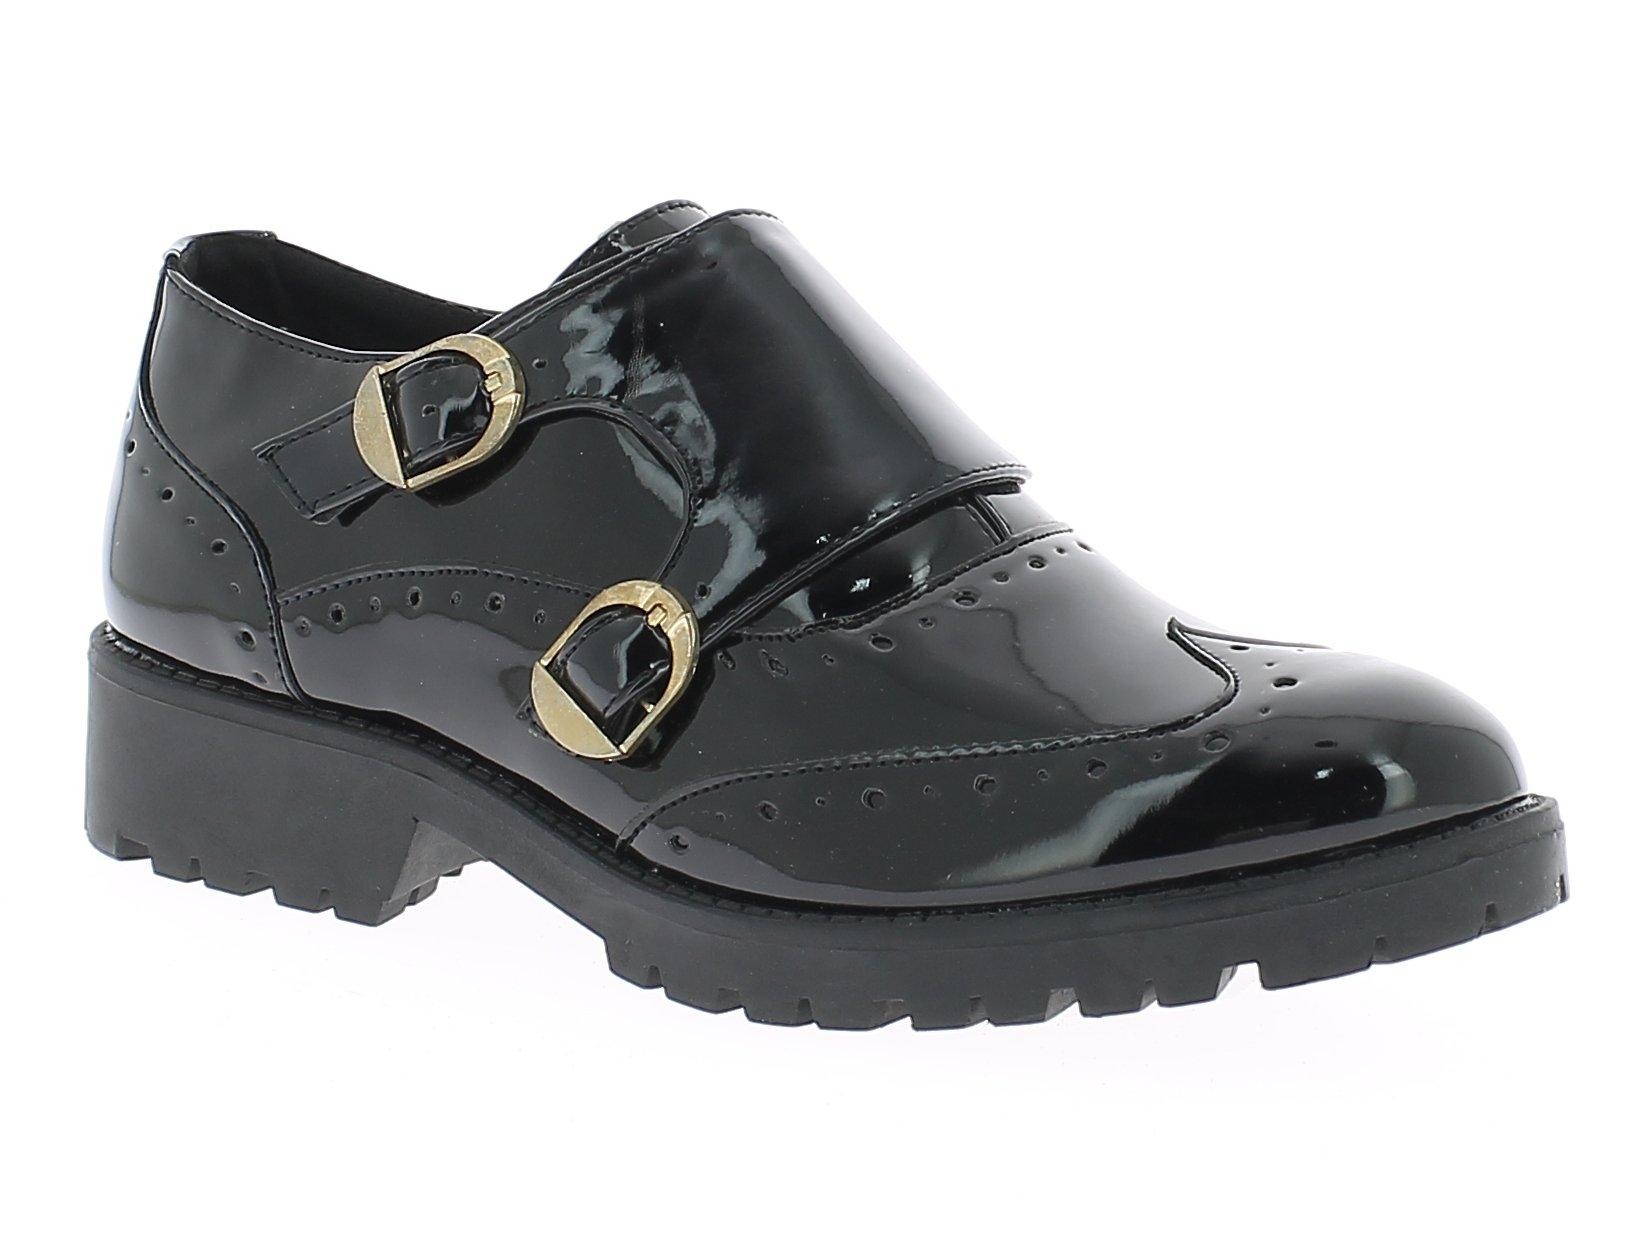 TOPWAY Γυναικείο Casual B080891 Μαύρο - IqShoes - B080891 BLACK black 37/1/15/27 προϊόντα παπούτσια